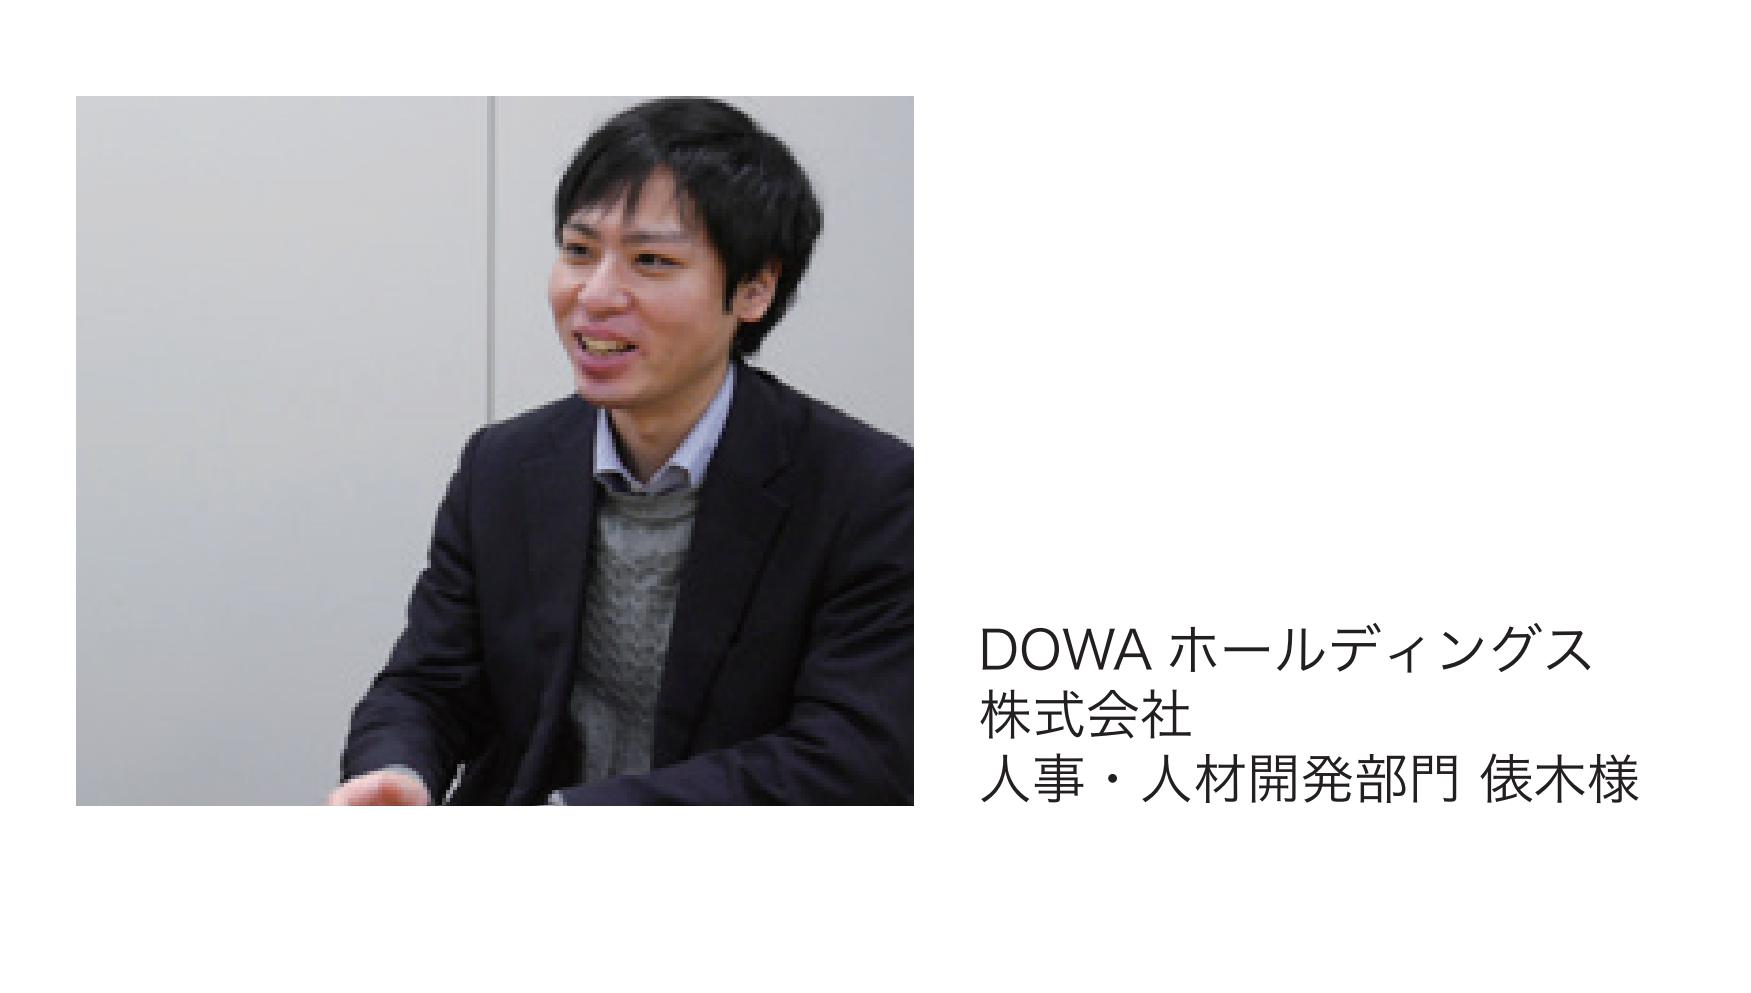 DOWA ホールディングス <br />株式会社人事・人材開発部門 俵木様